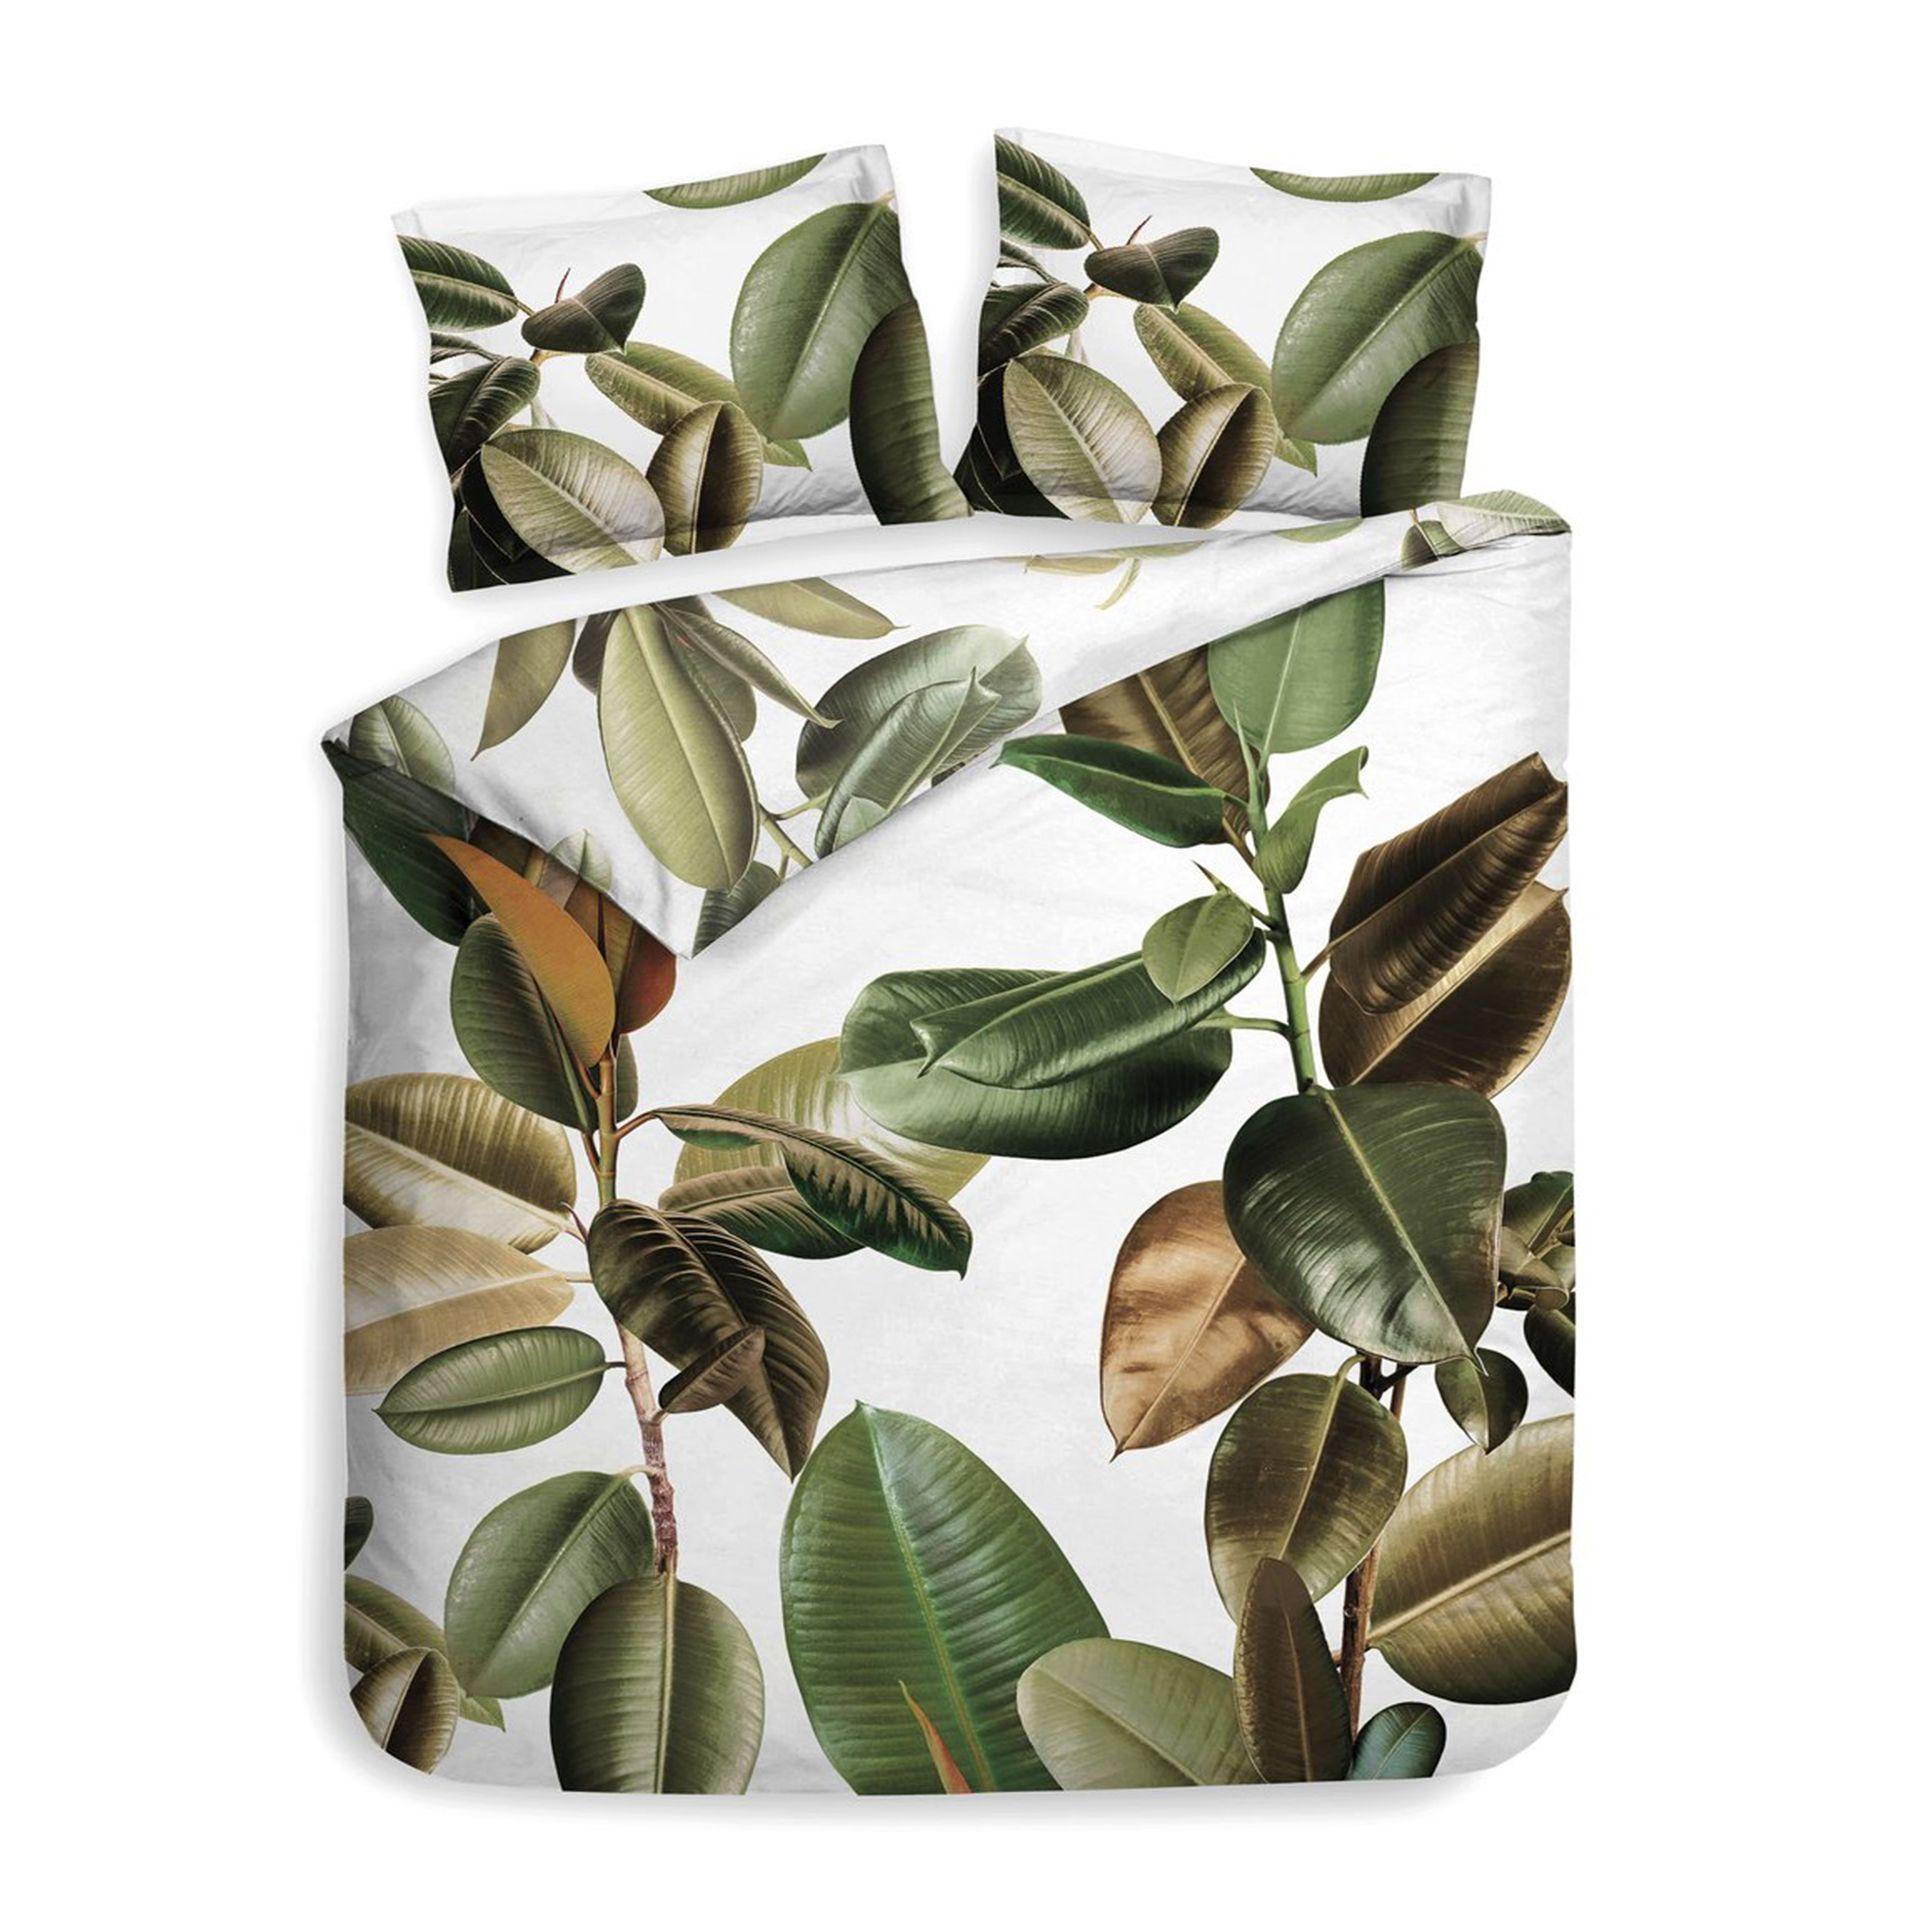 Heckettlane - Bladel leaf green Dekbedovertrek